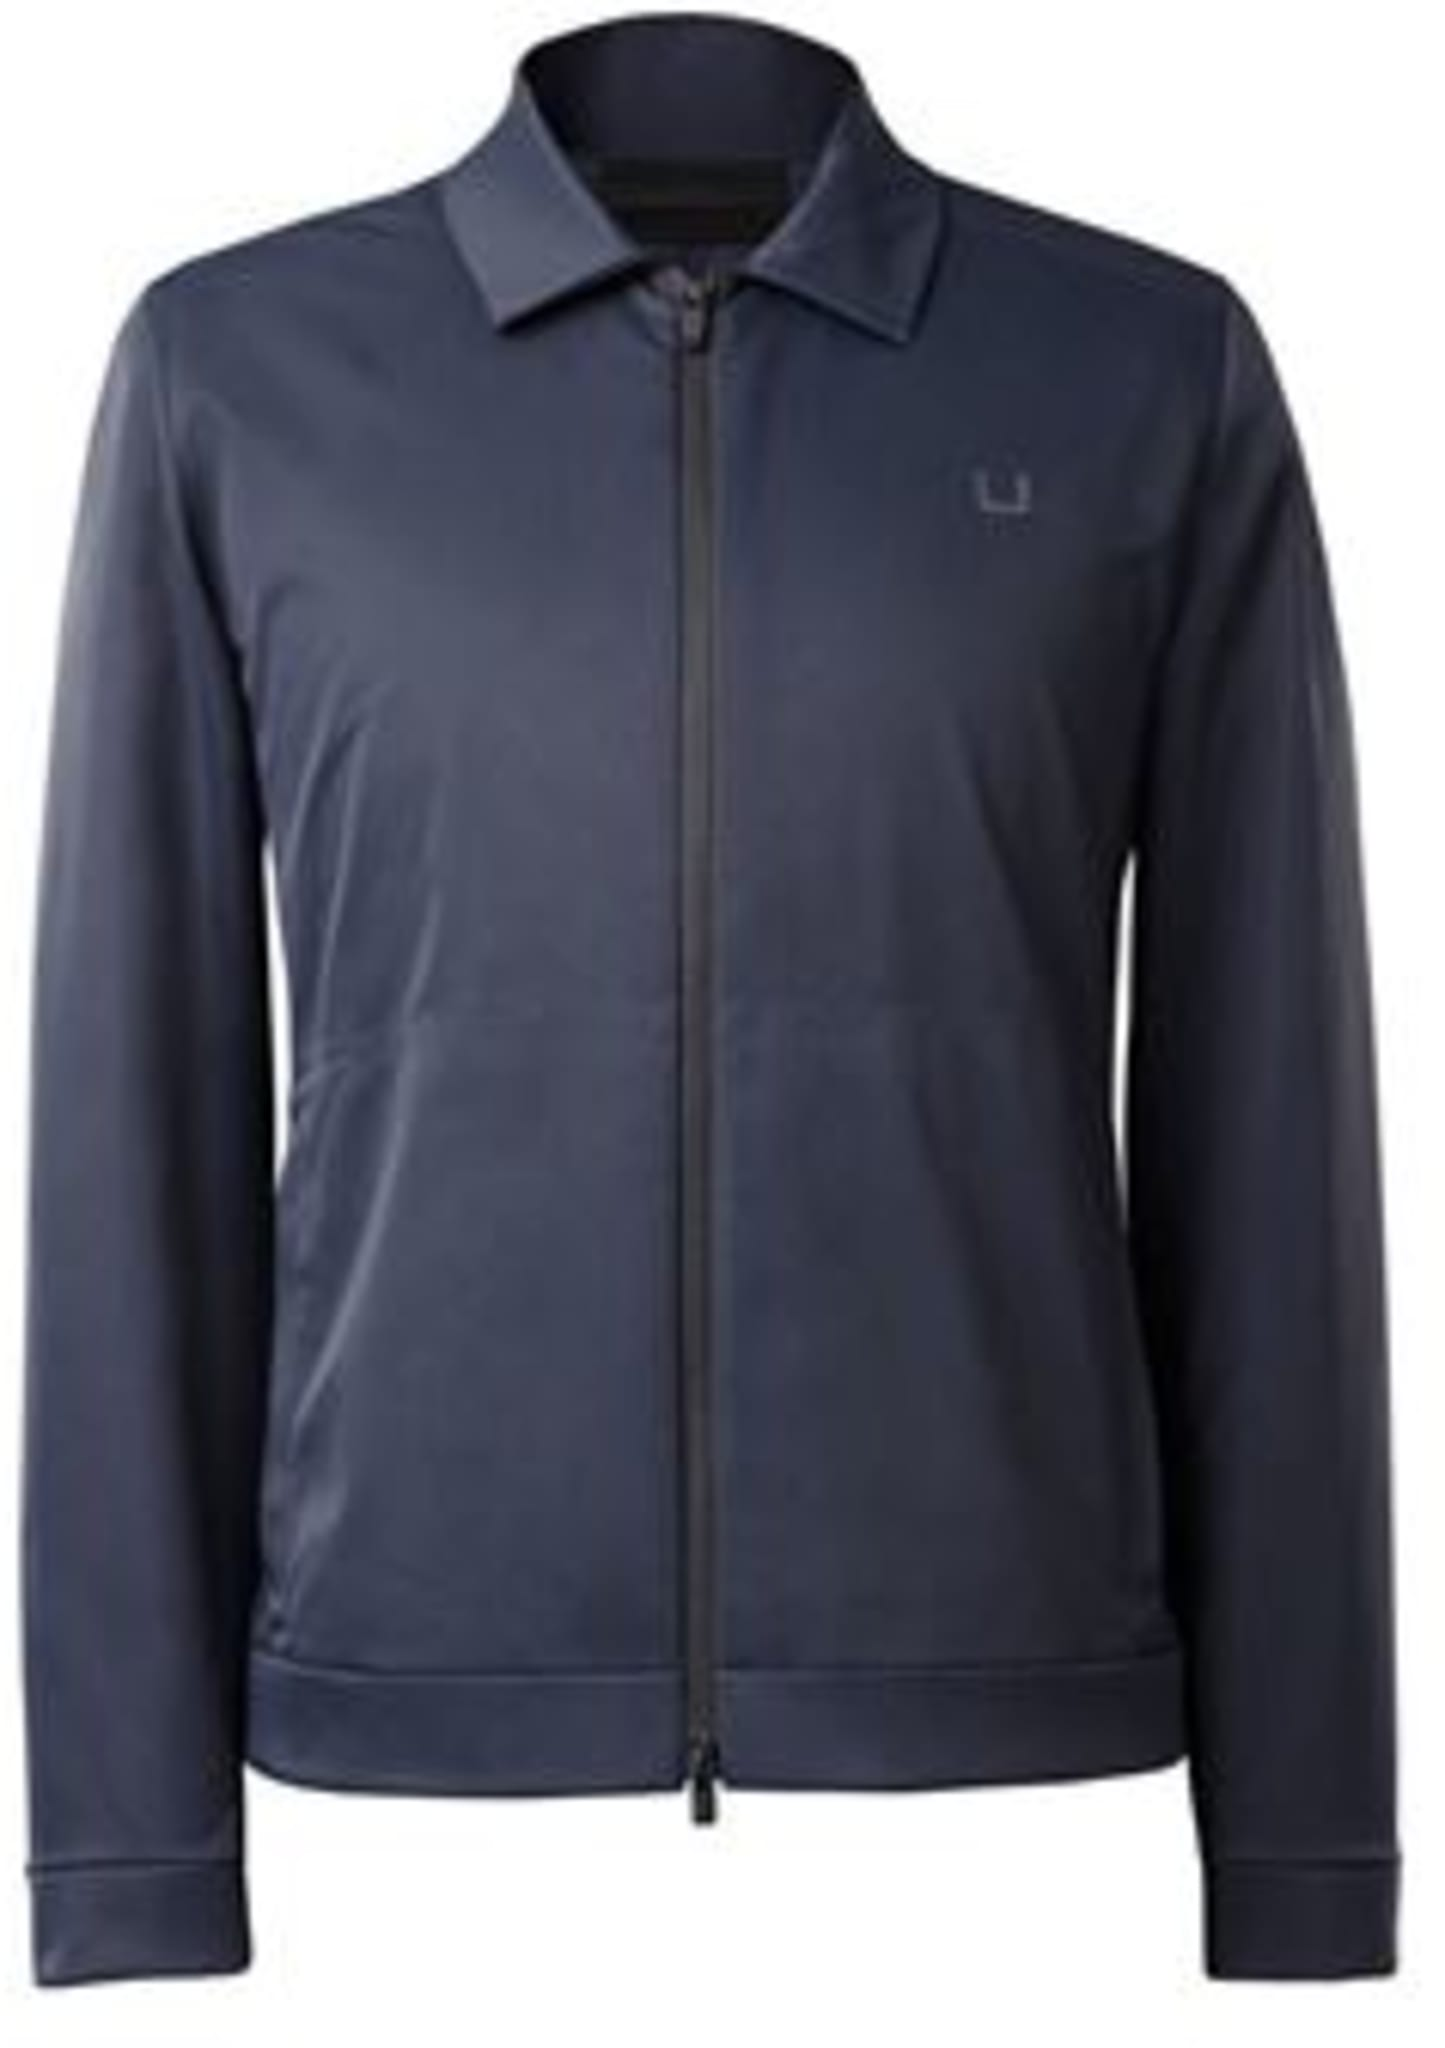 Nano Jacket Ms